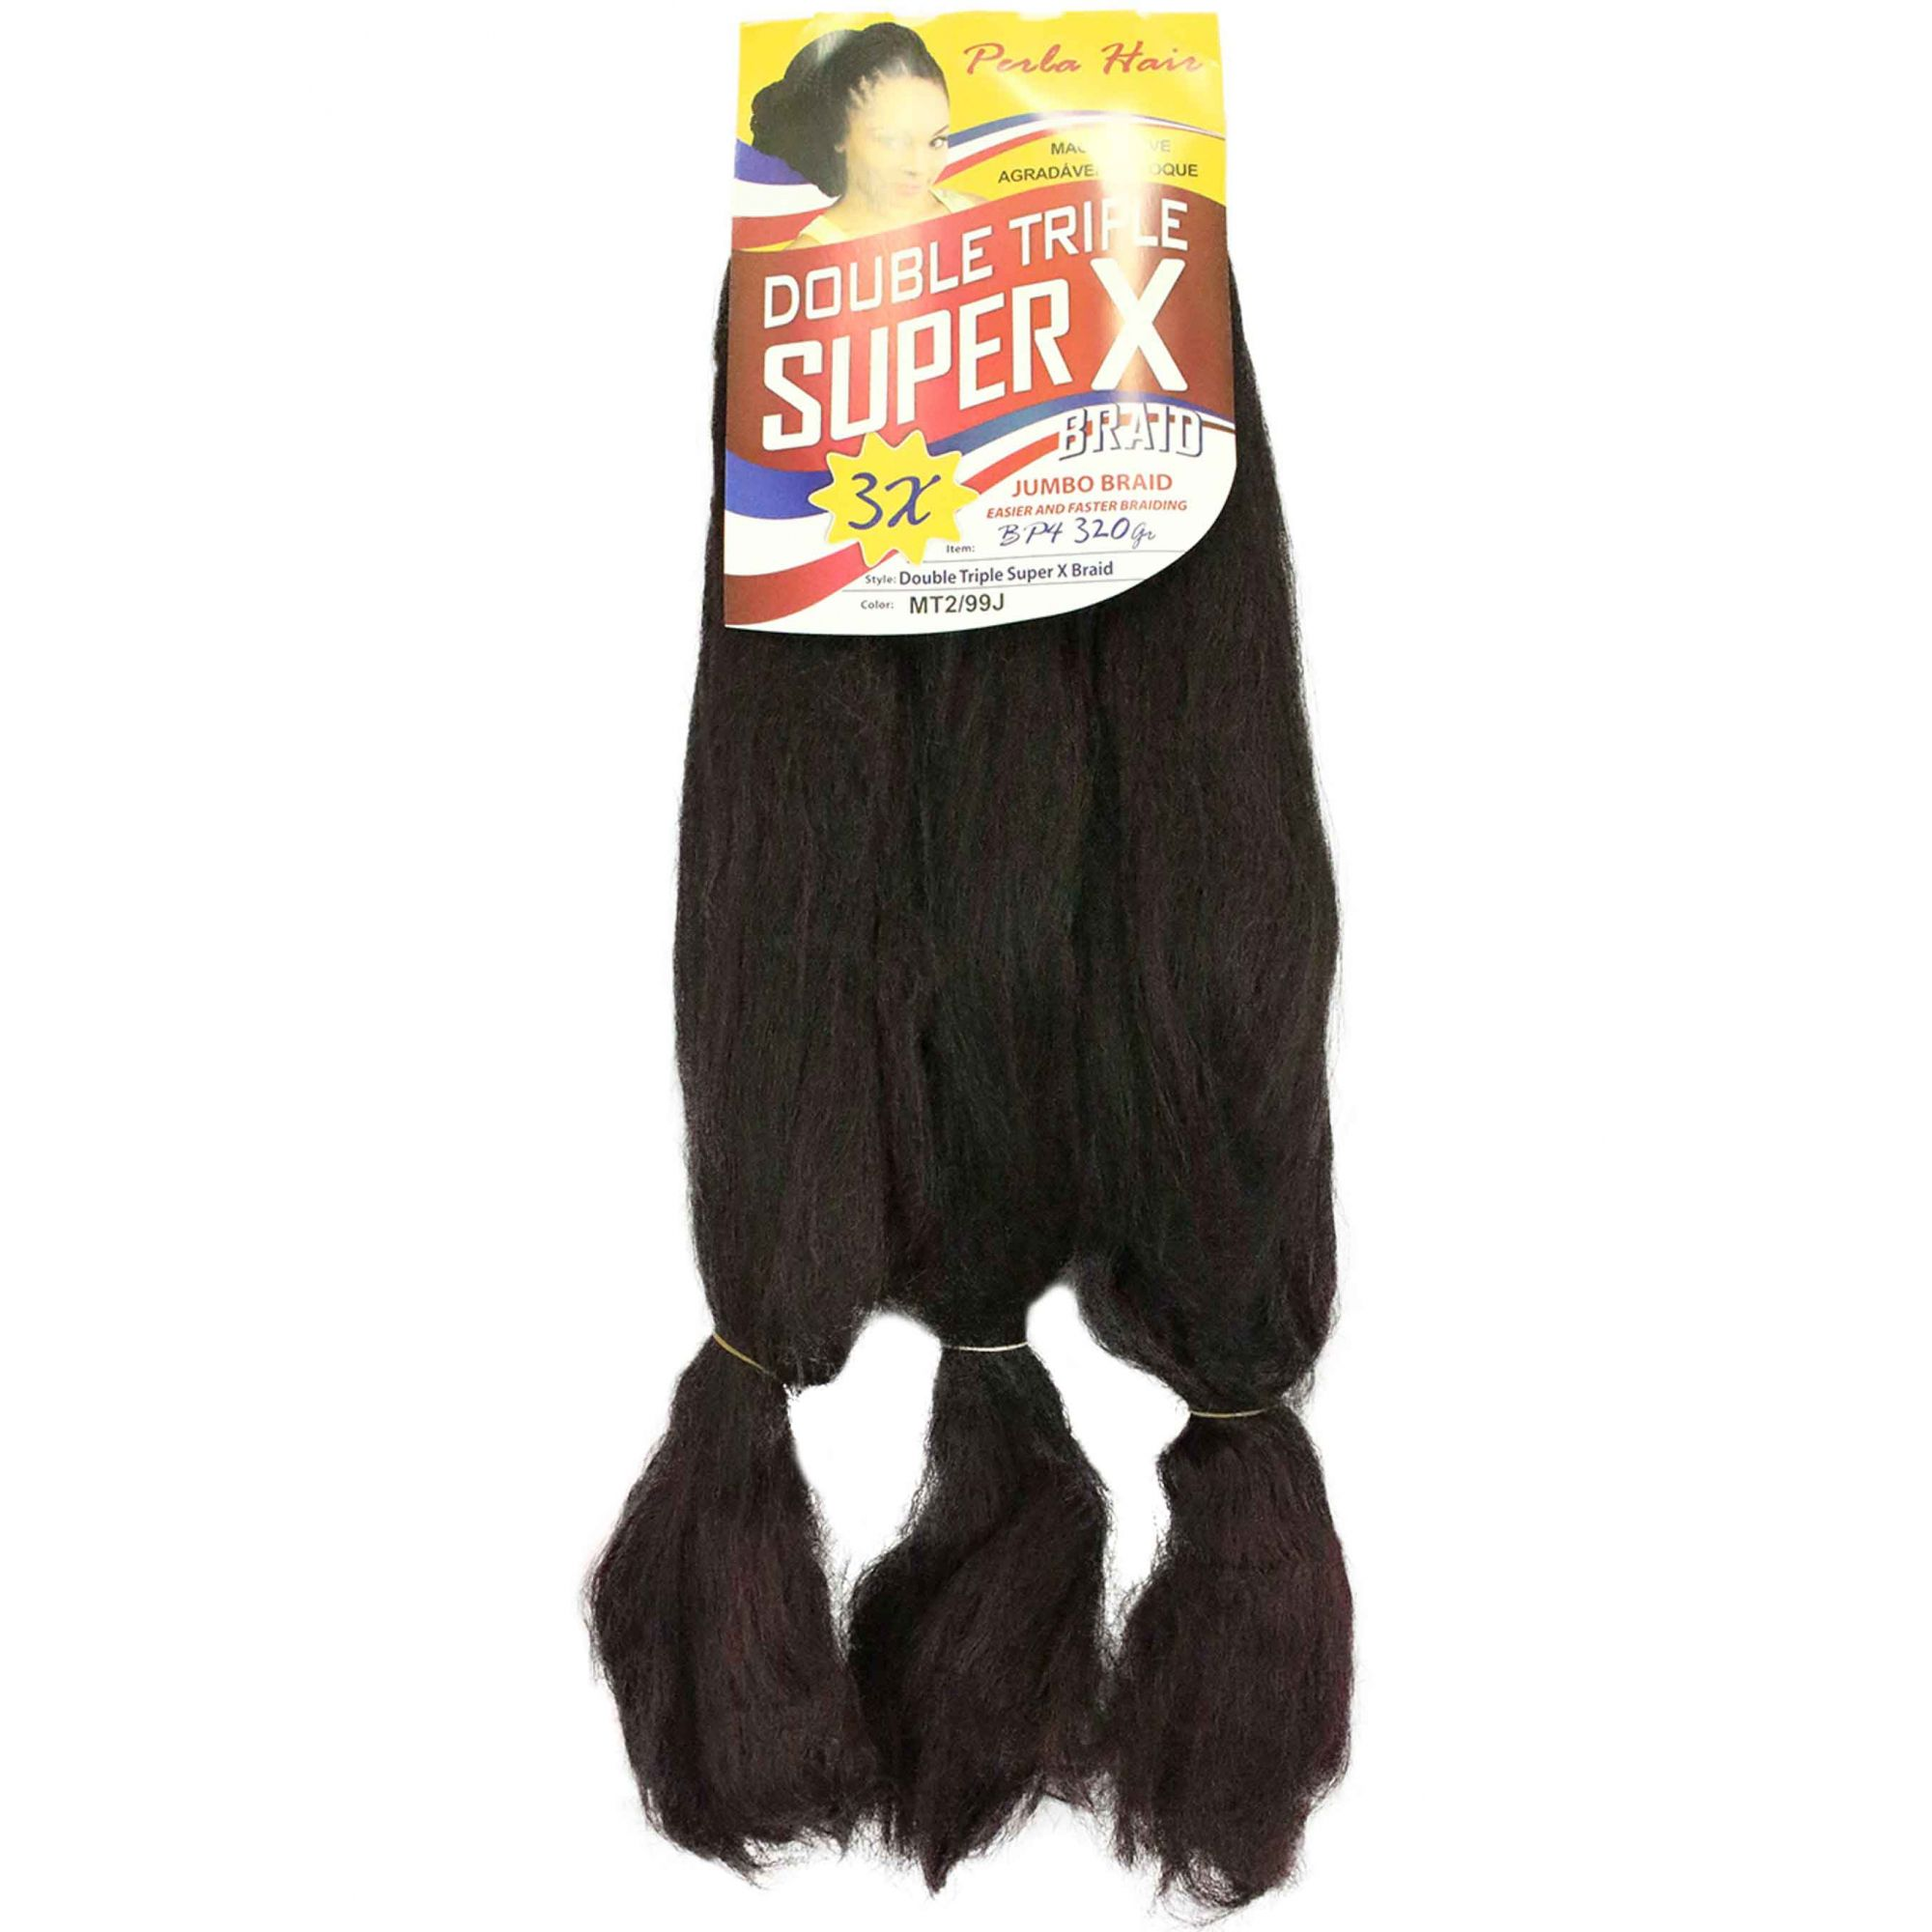 Cabelo Sintético - Zhang hair jumbo - Super X (400g) - Cor: Castanho escuro com Acaju (MT2/99J)